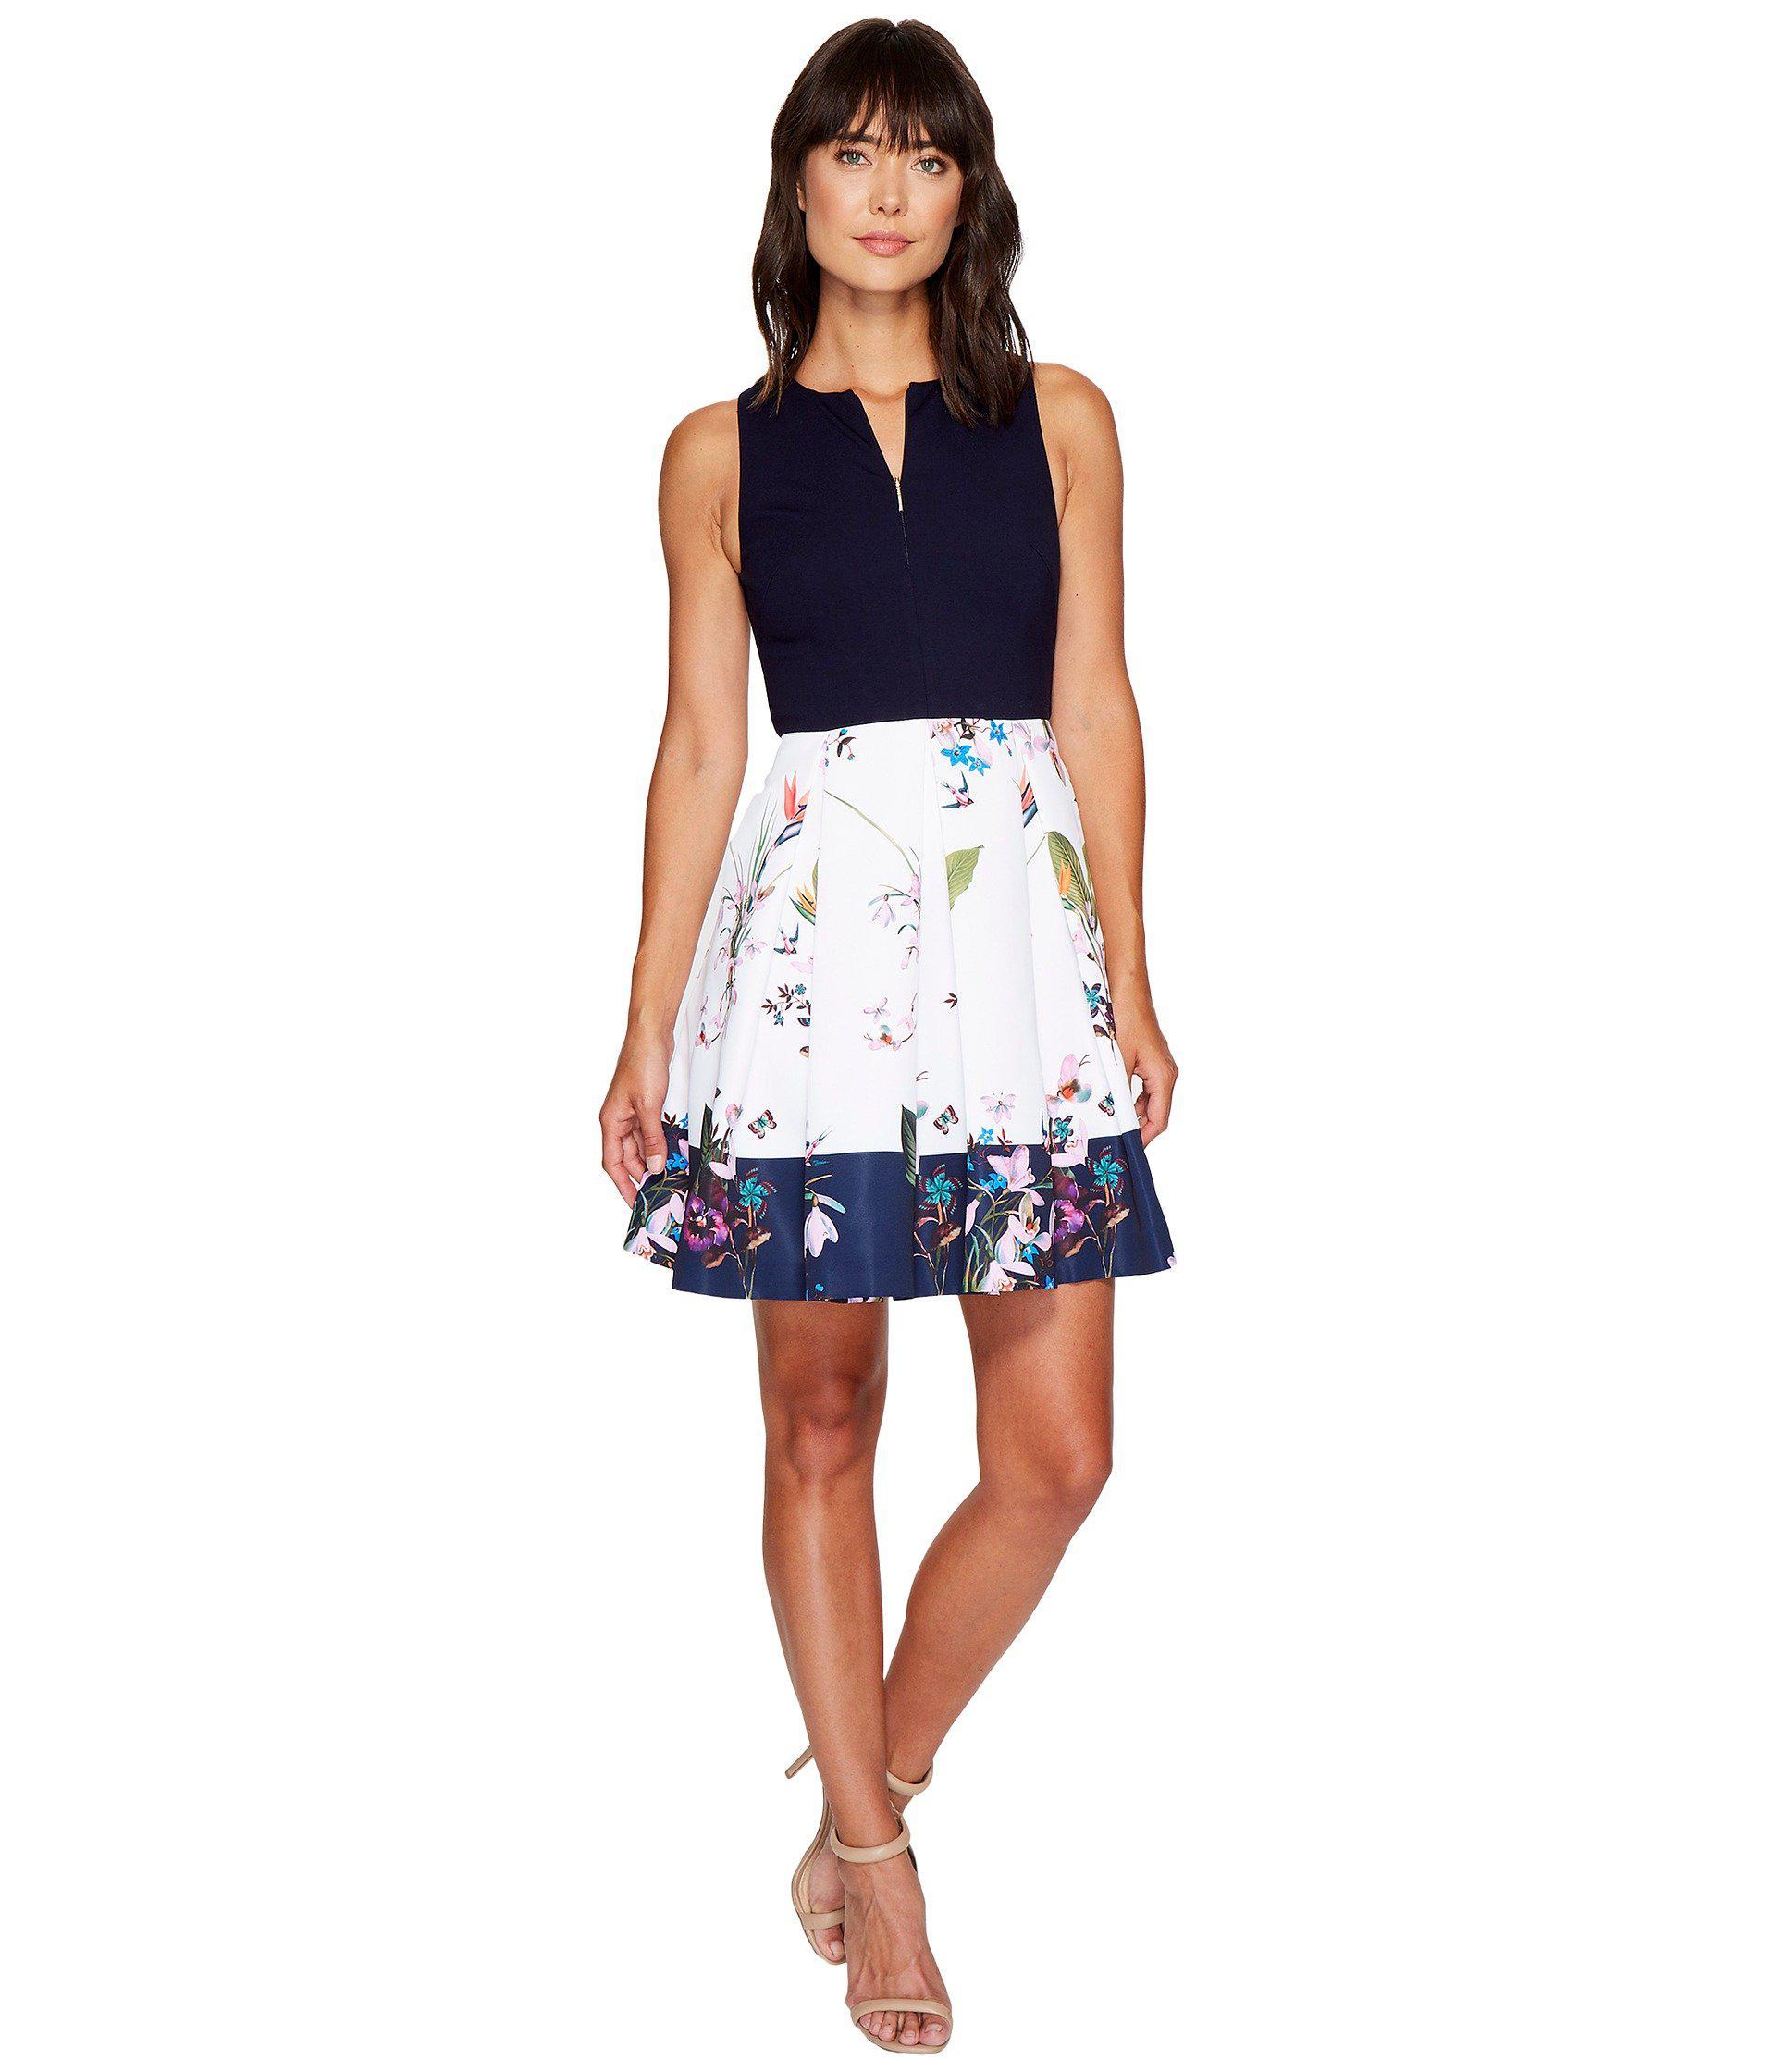 7b6effb66 Lyst - Ted Baker Petali Tropical Oasis Bodice Dress in Blue